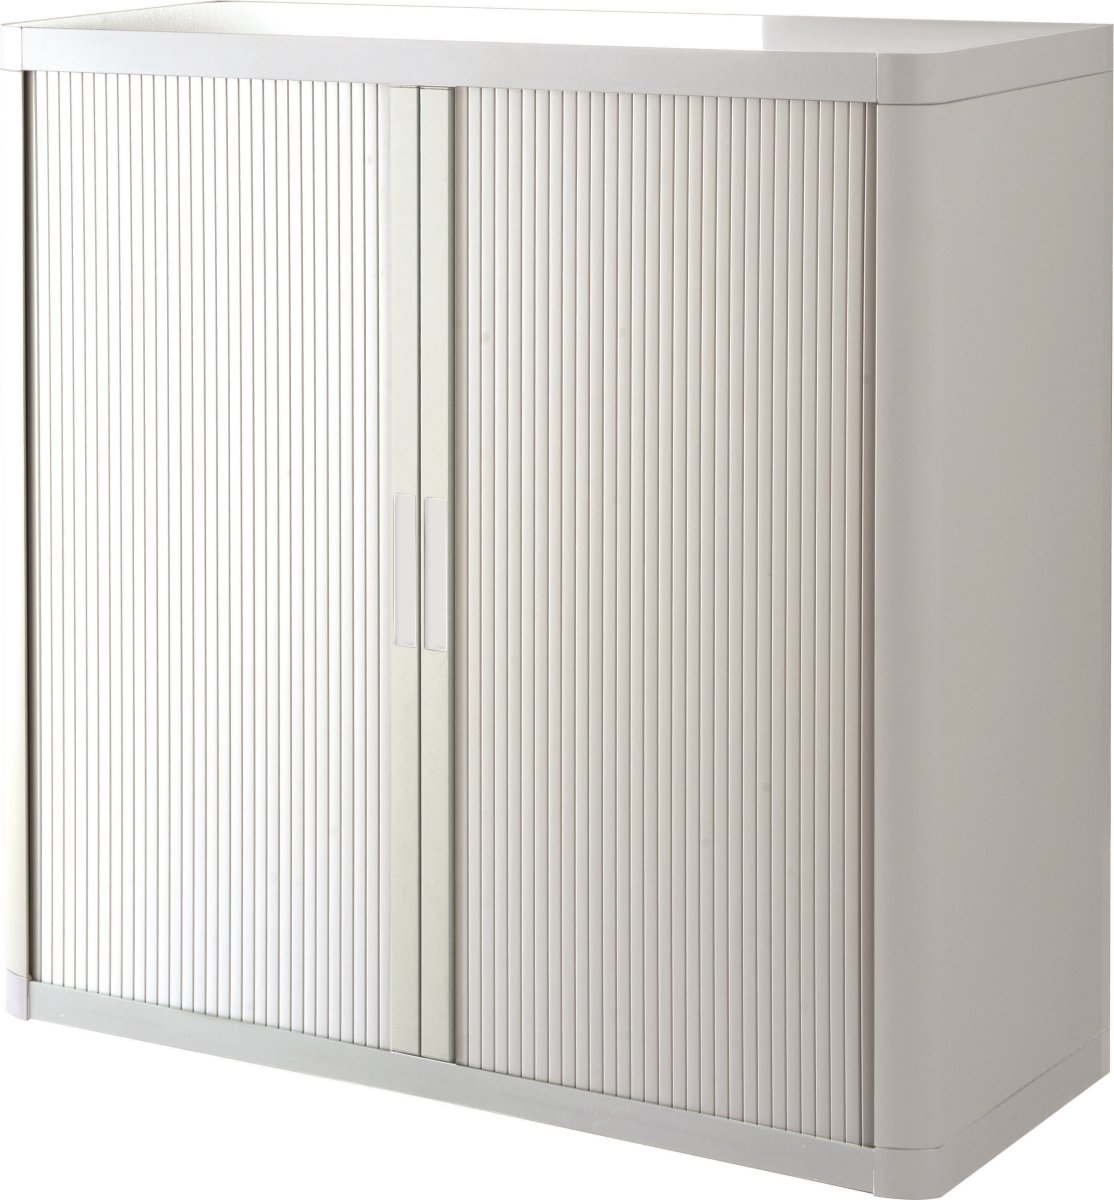 Paperflow Easy Office 1 m, 2 hylder, Hvid